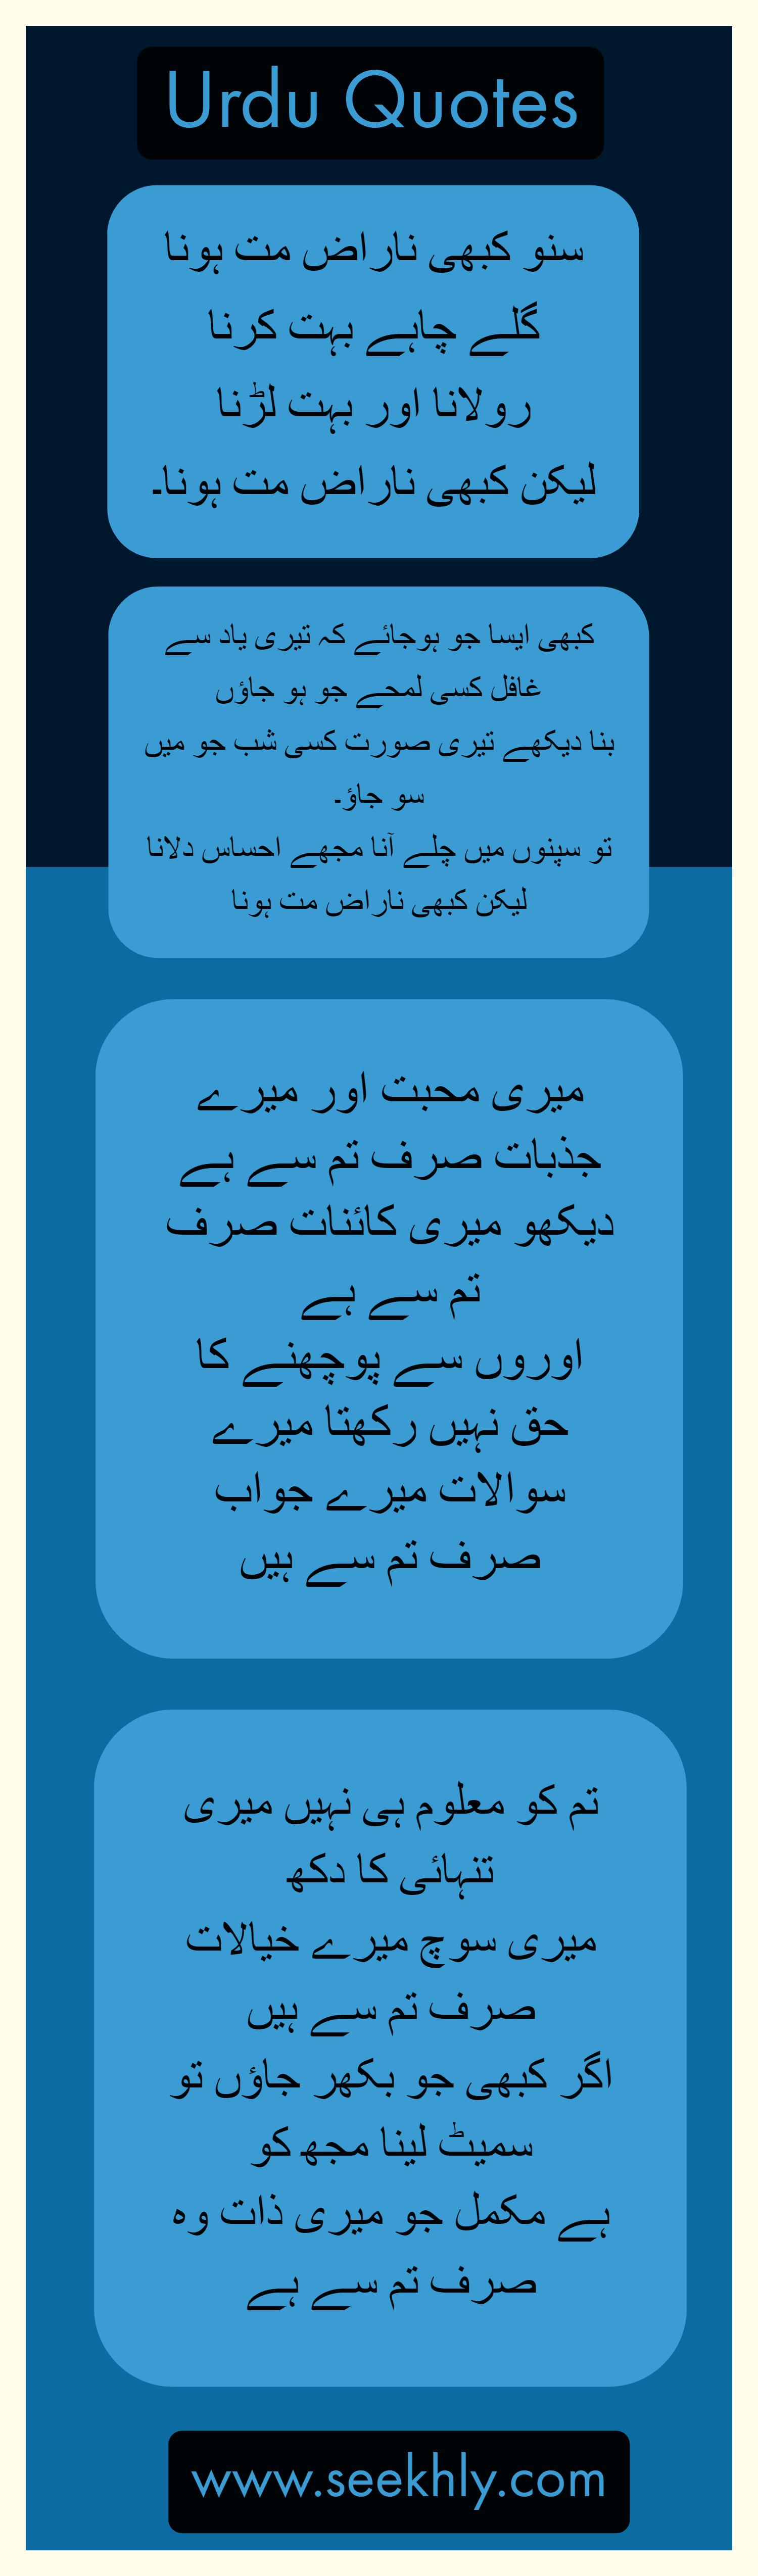 Sona kabi naraz mat hona, urdu quotes, infographic